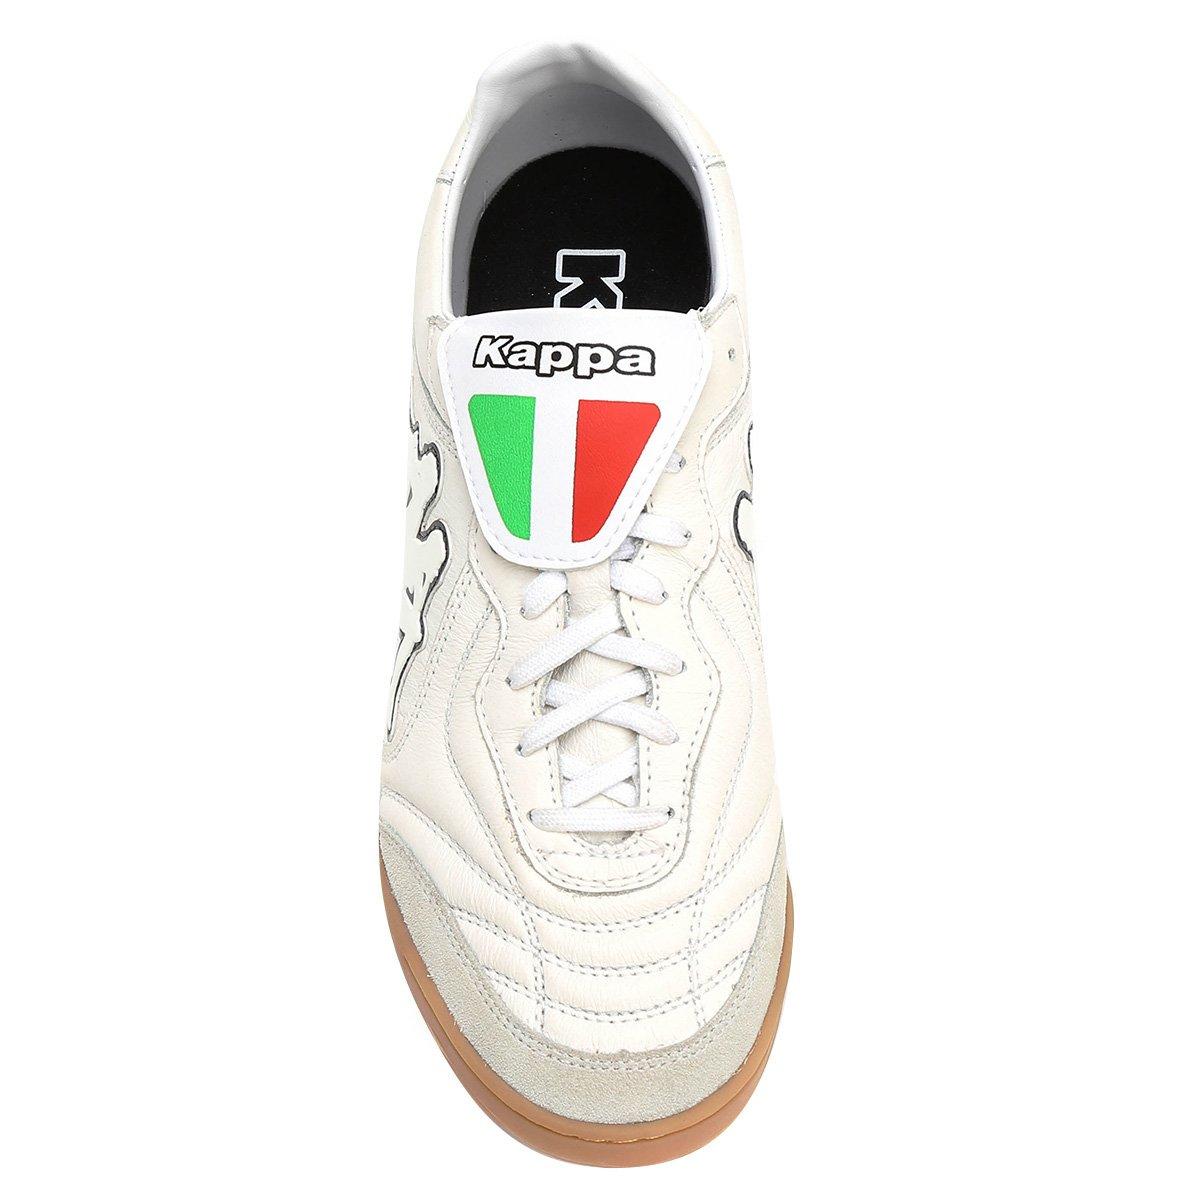 000d06b53b Chuteira Futsal Kappa Pelle Couro - Off White - Compre Agora ...